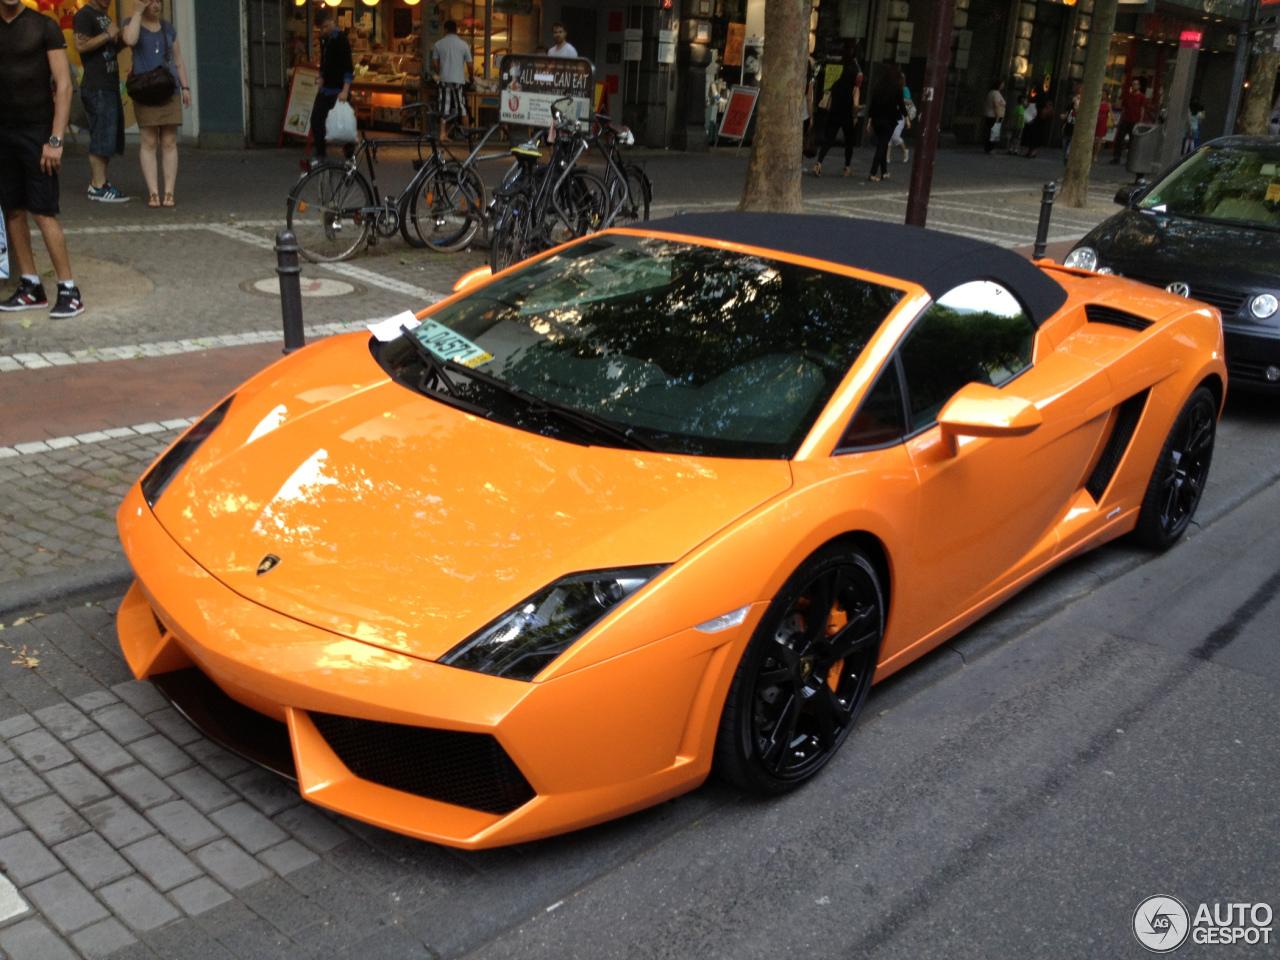 Marvelous Lamborghini Gallardo LP560 4 Spyder